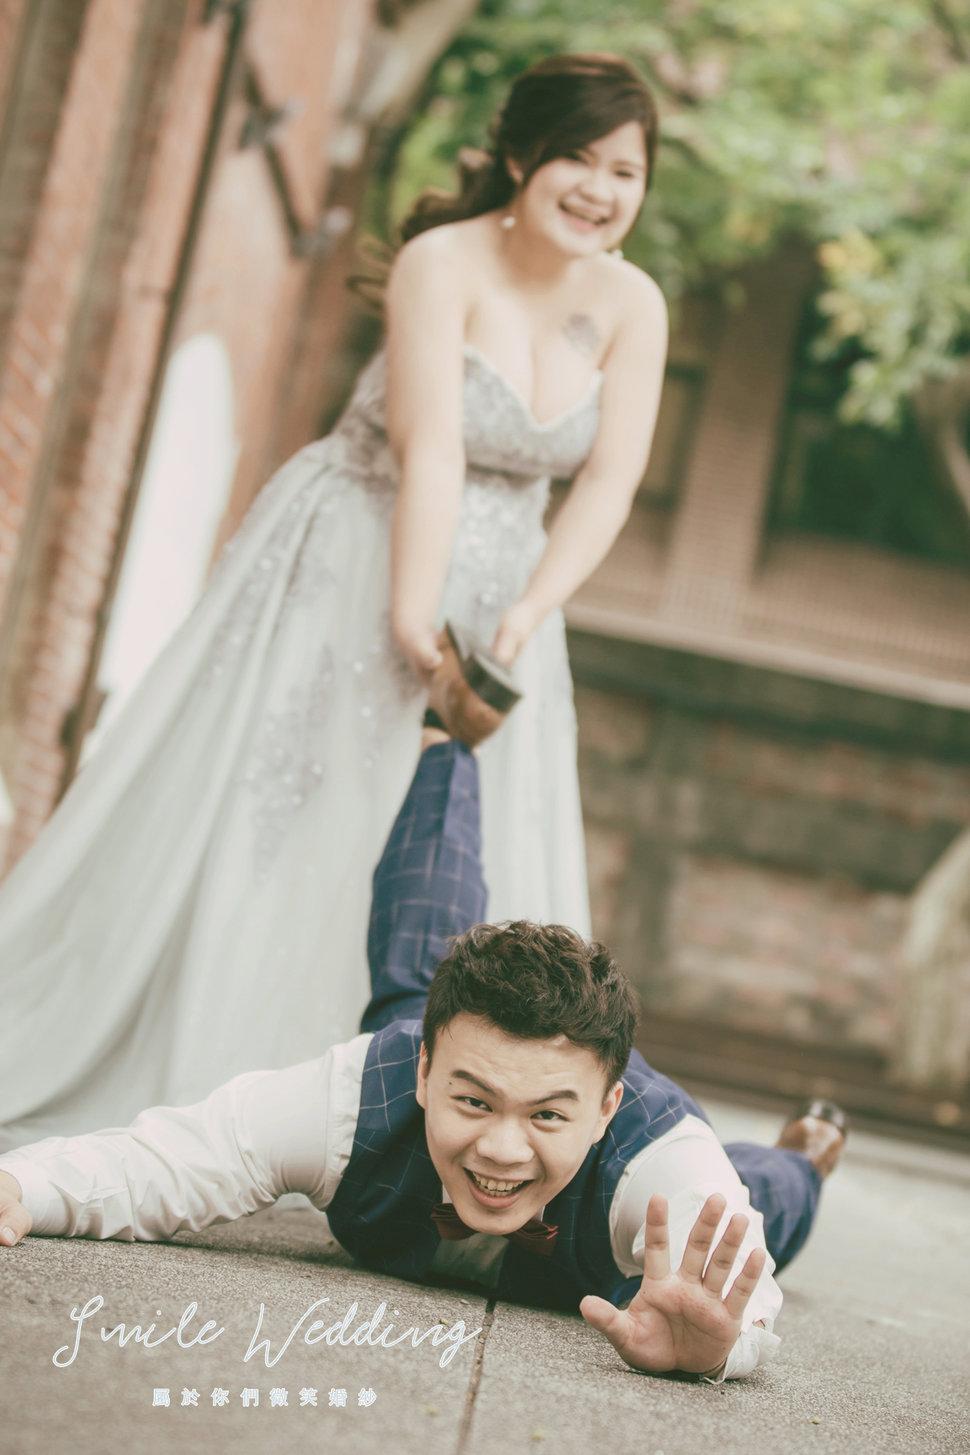 IMGL5798 - Smile wedding 微笑婚紗《結婚吧》